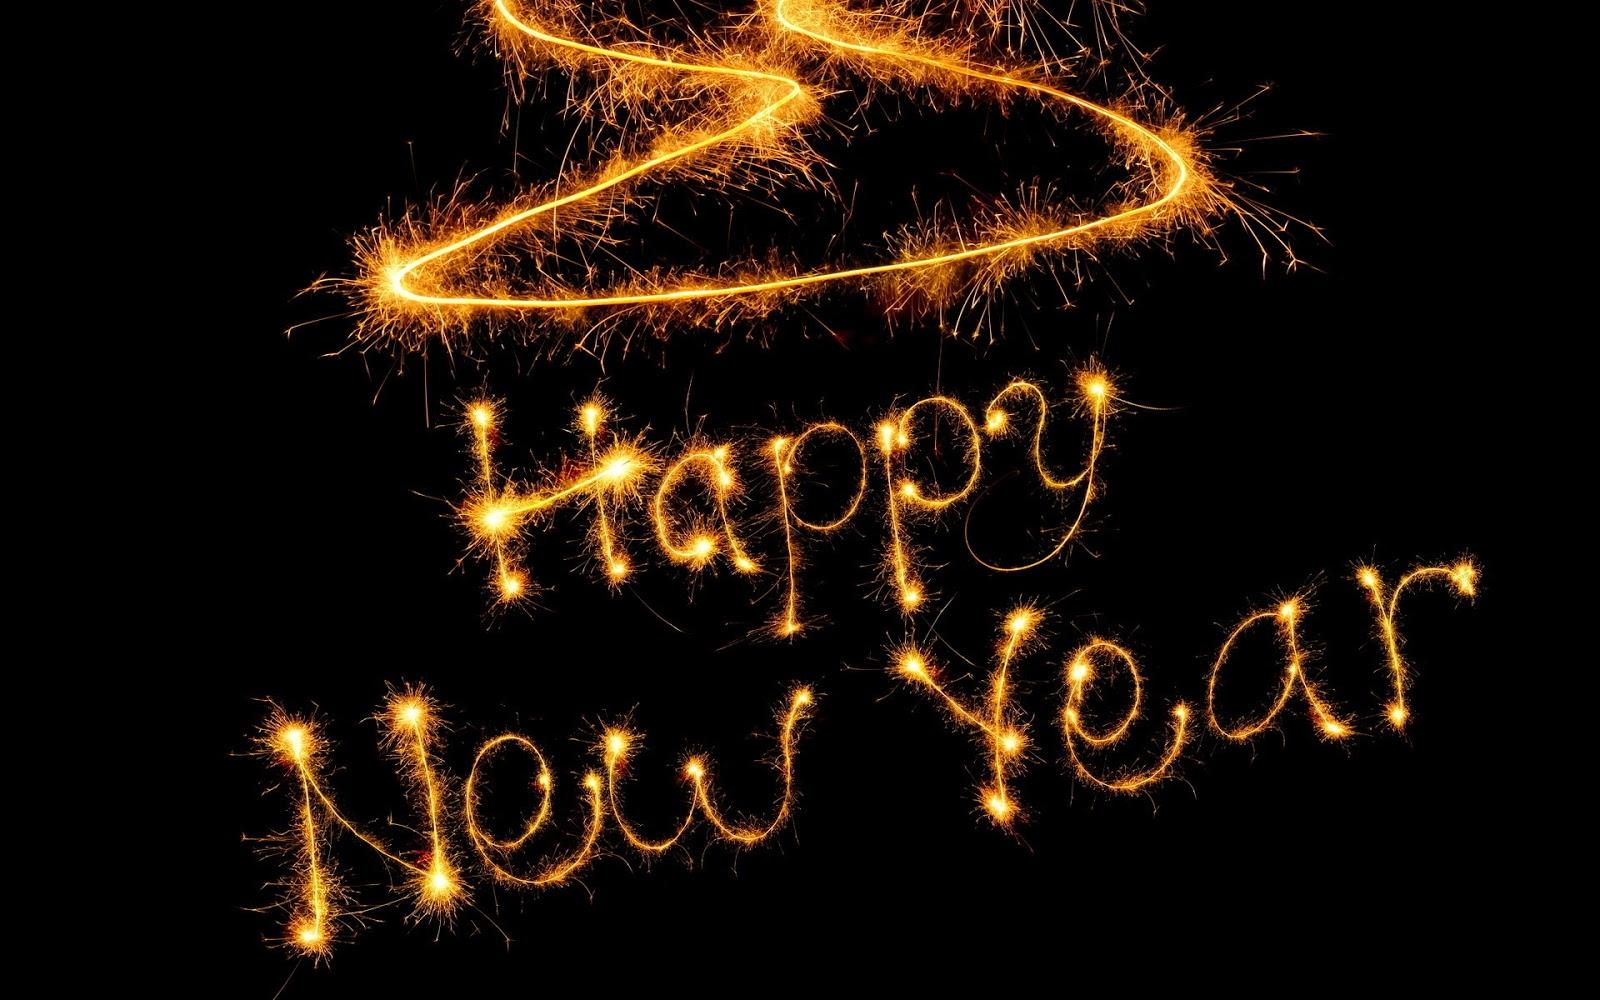 Happy New Year 2013 HD Wallpaper